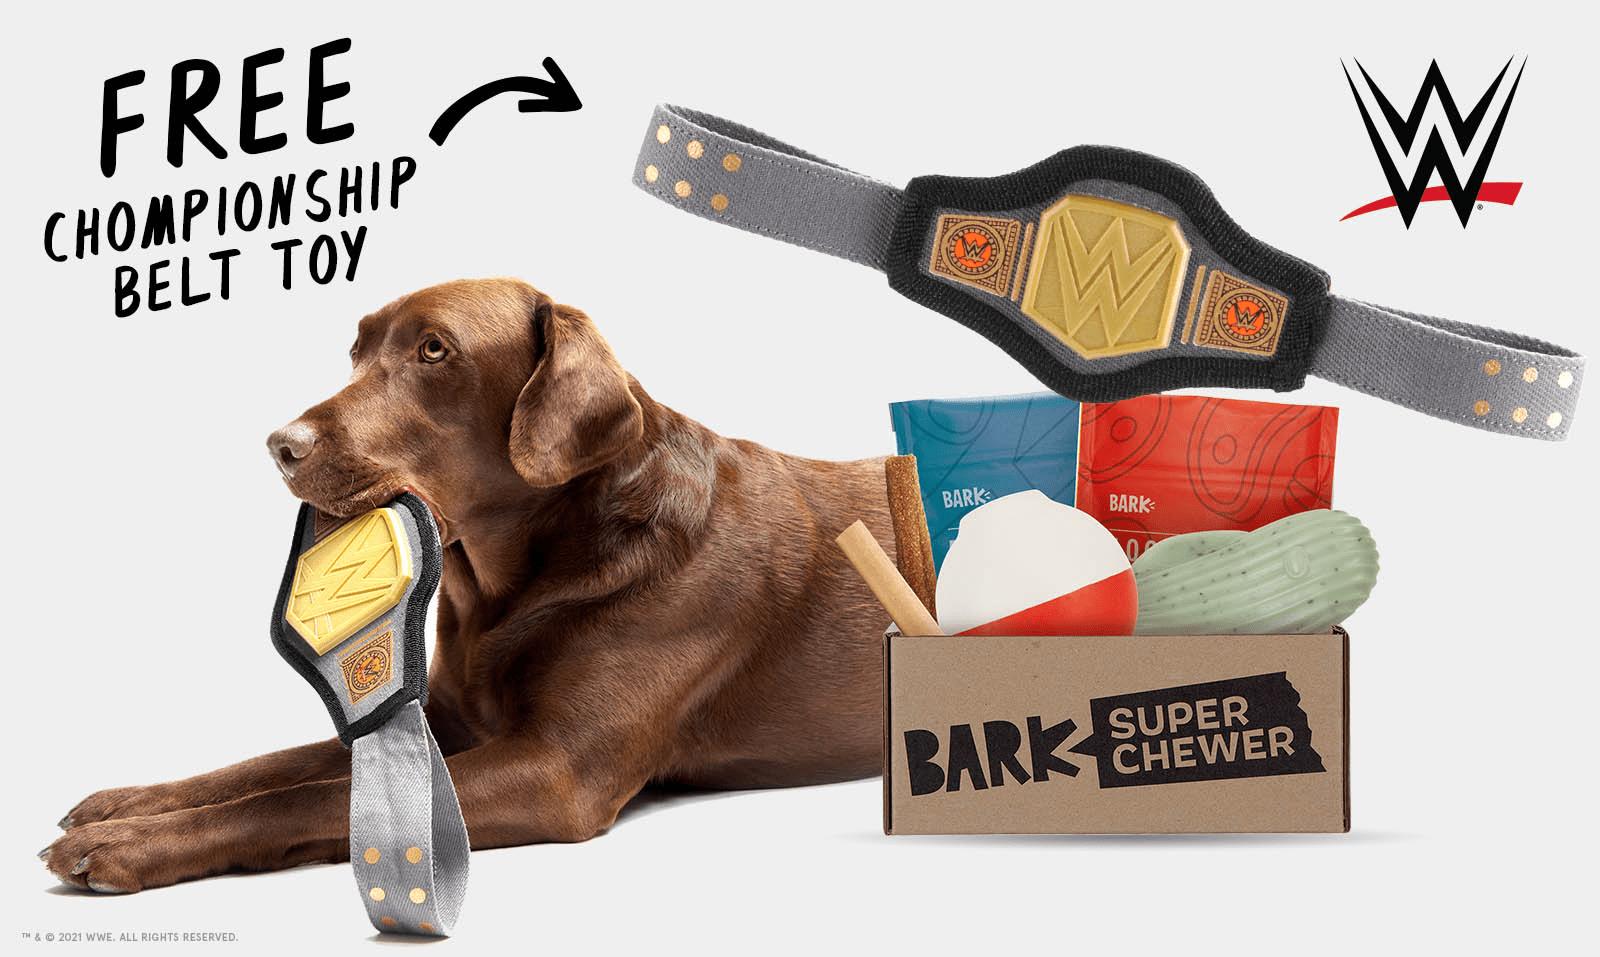 BarkBox Super Chewer Coupon Code – Free Championship Belt Toy